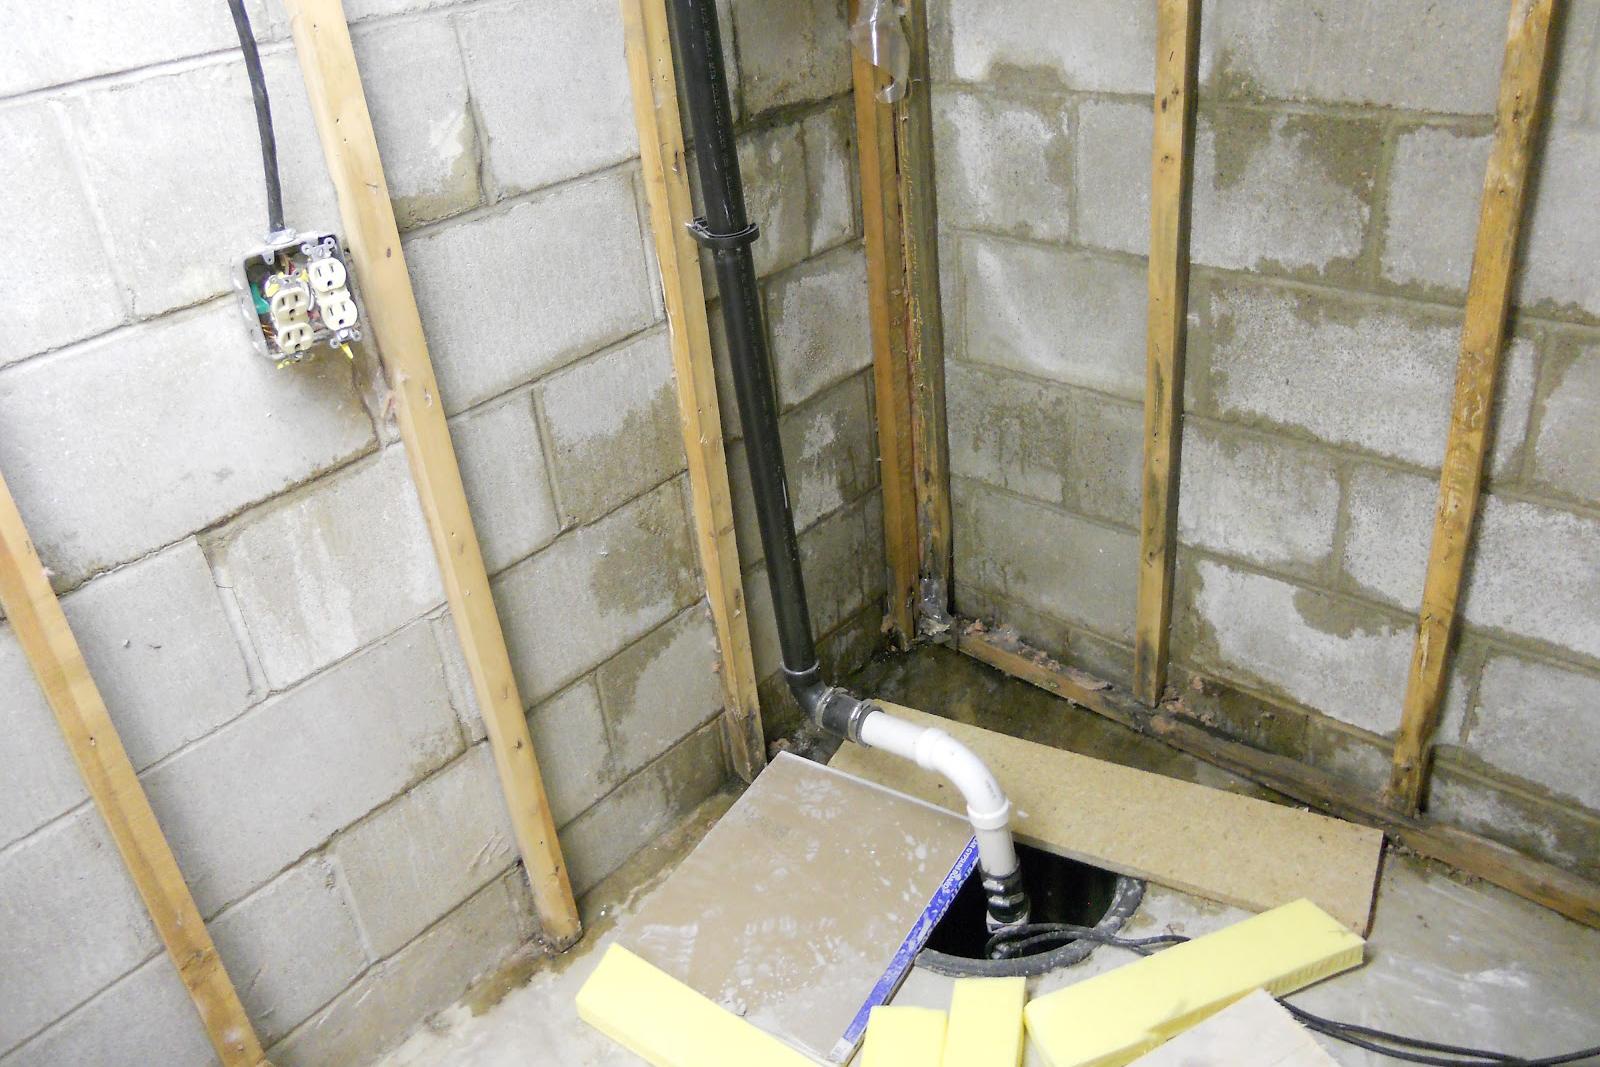 Sump pump in a residential basement